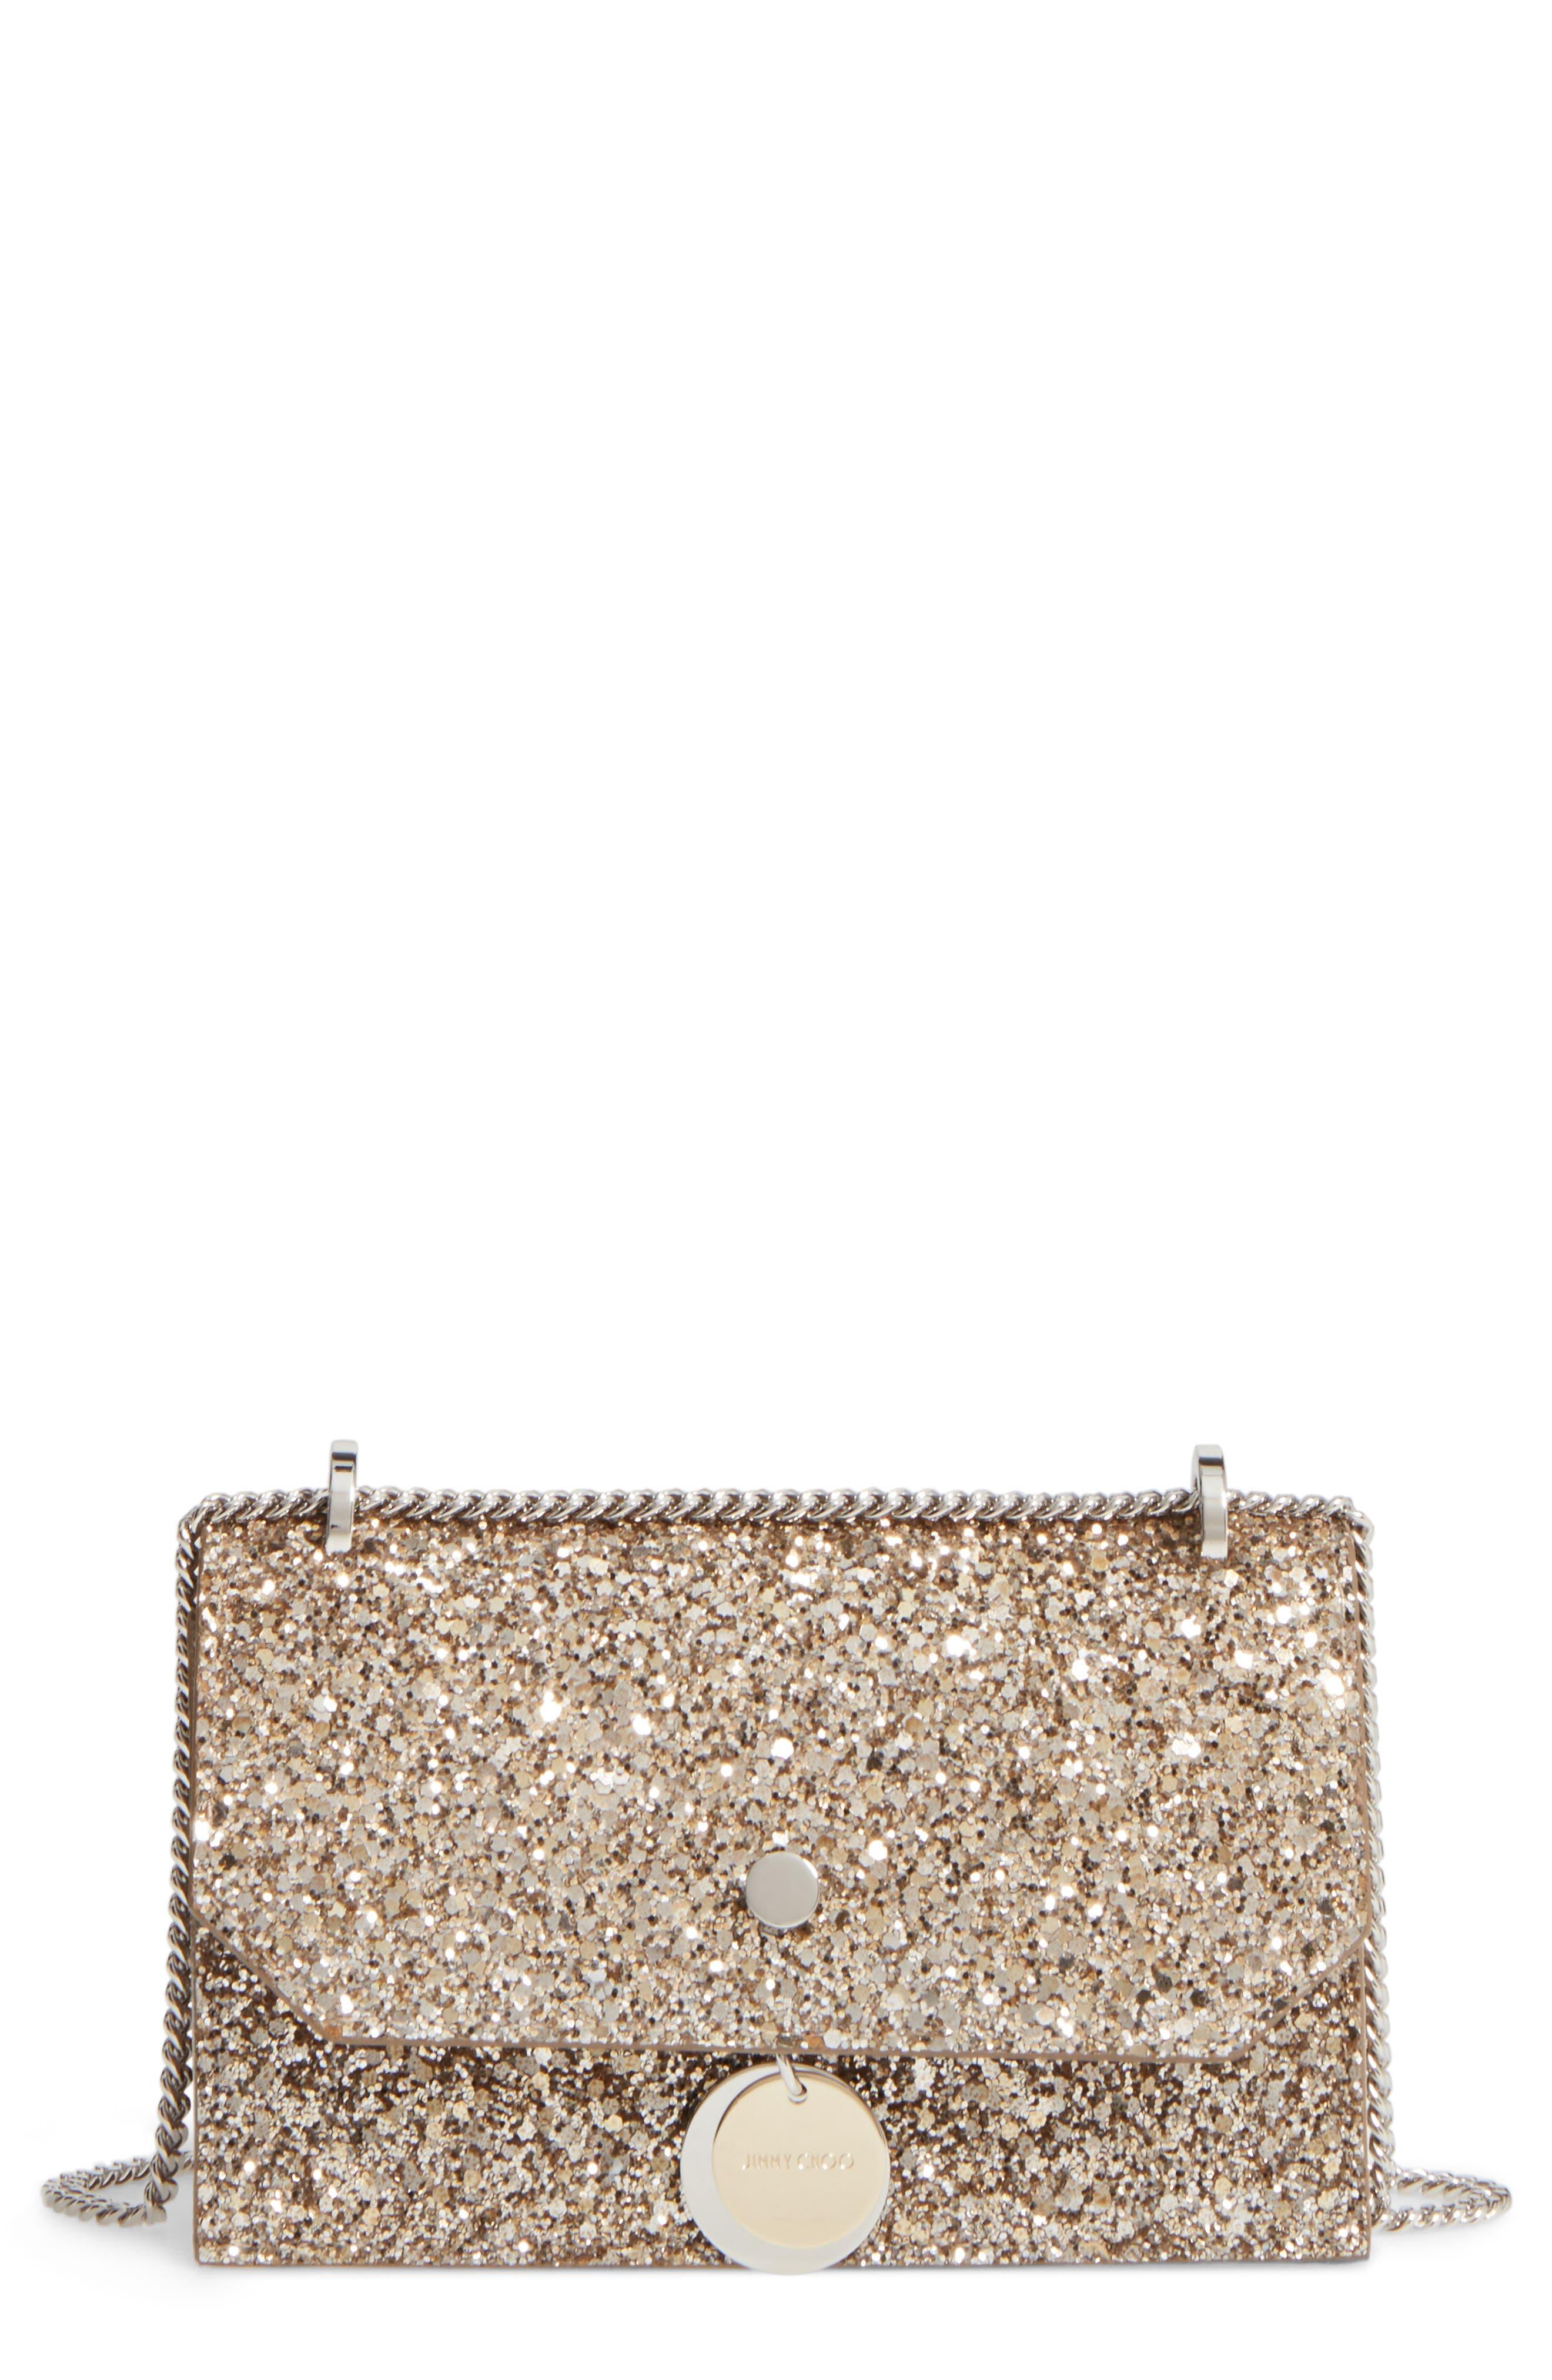 Finley Shadow Glitter Shoulder Bag,                         Main,                         color, Antique Gold